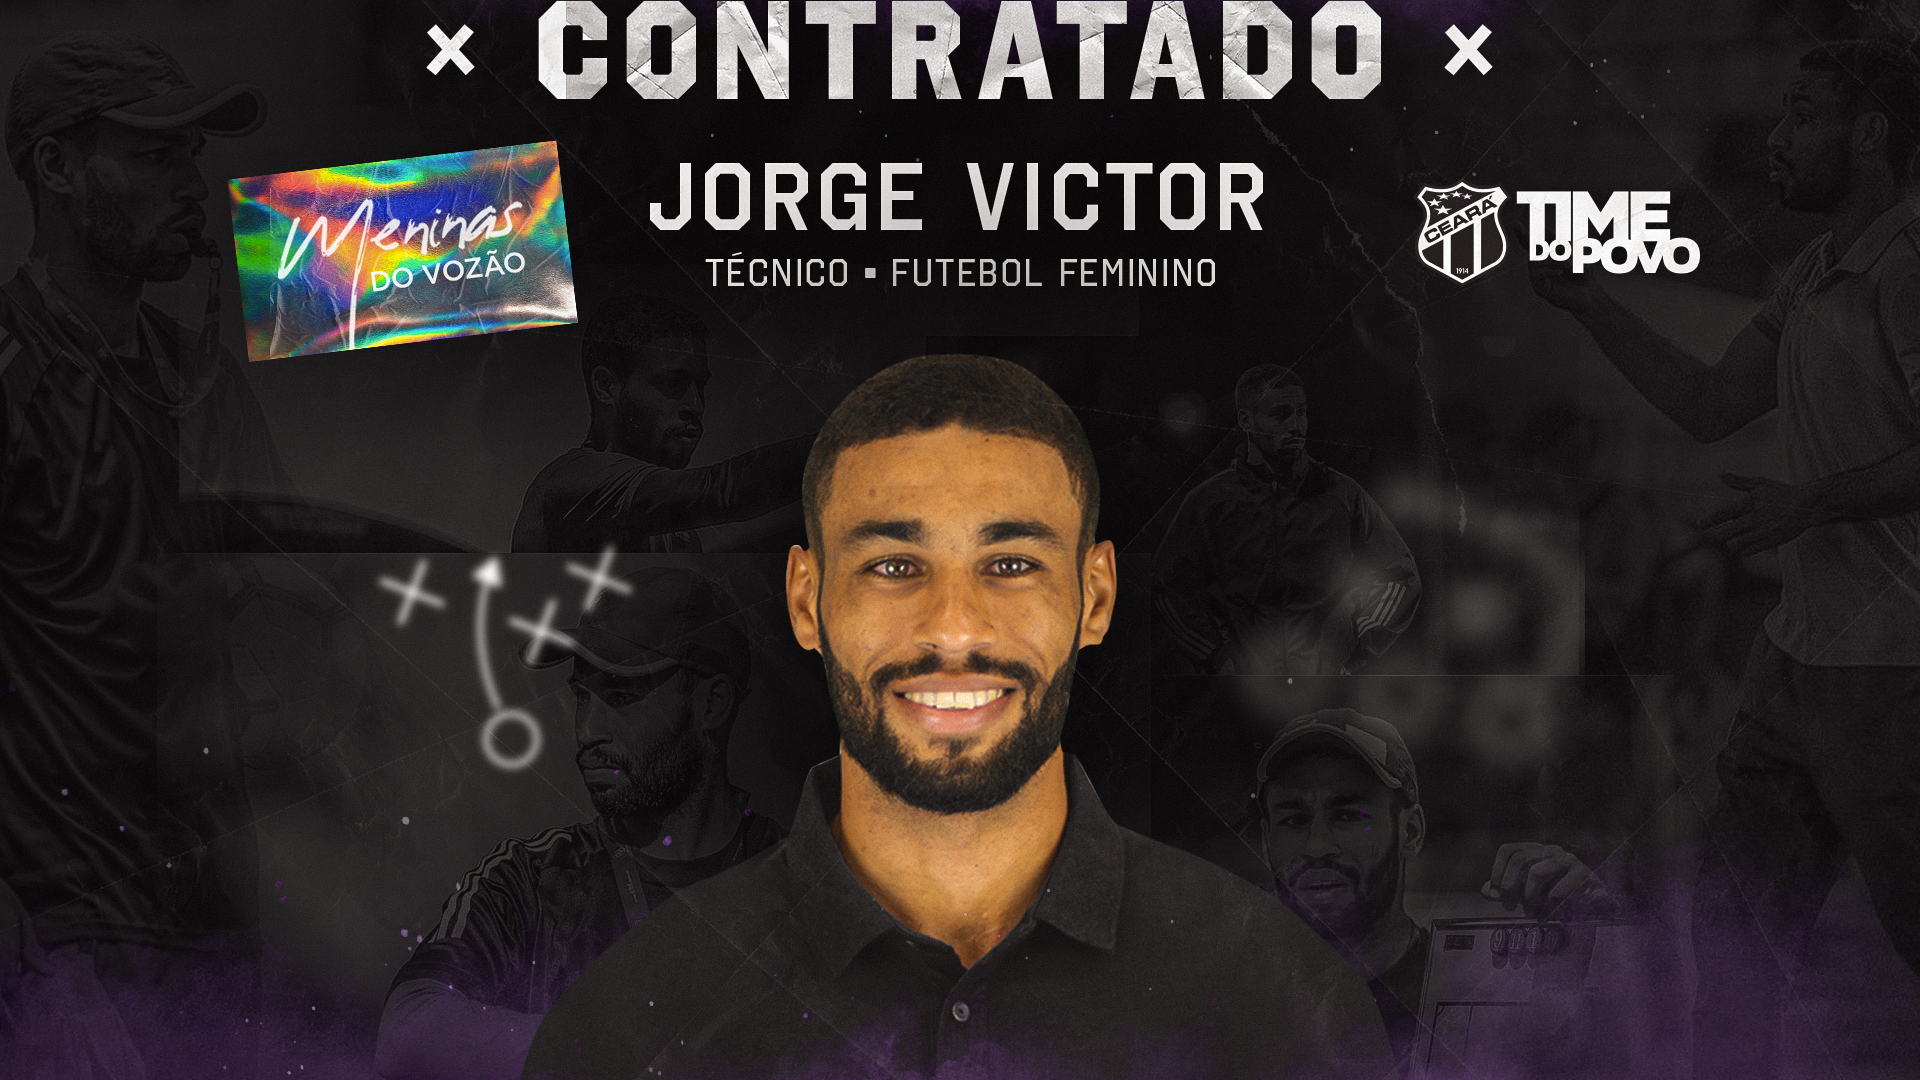 Jorge Victor